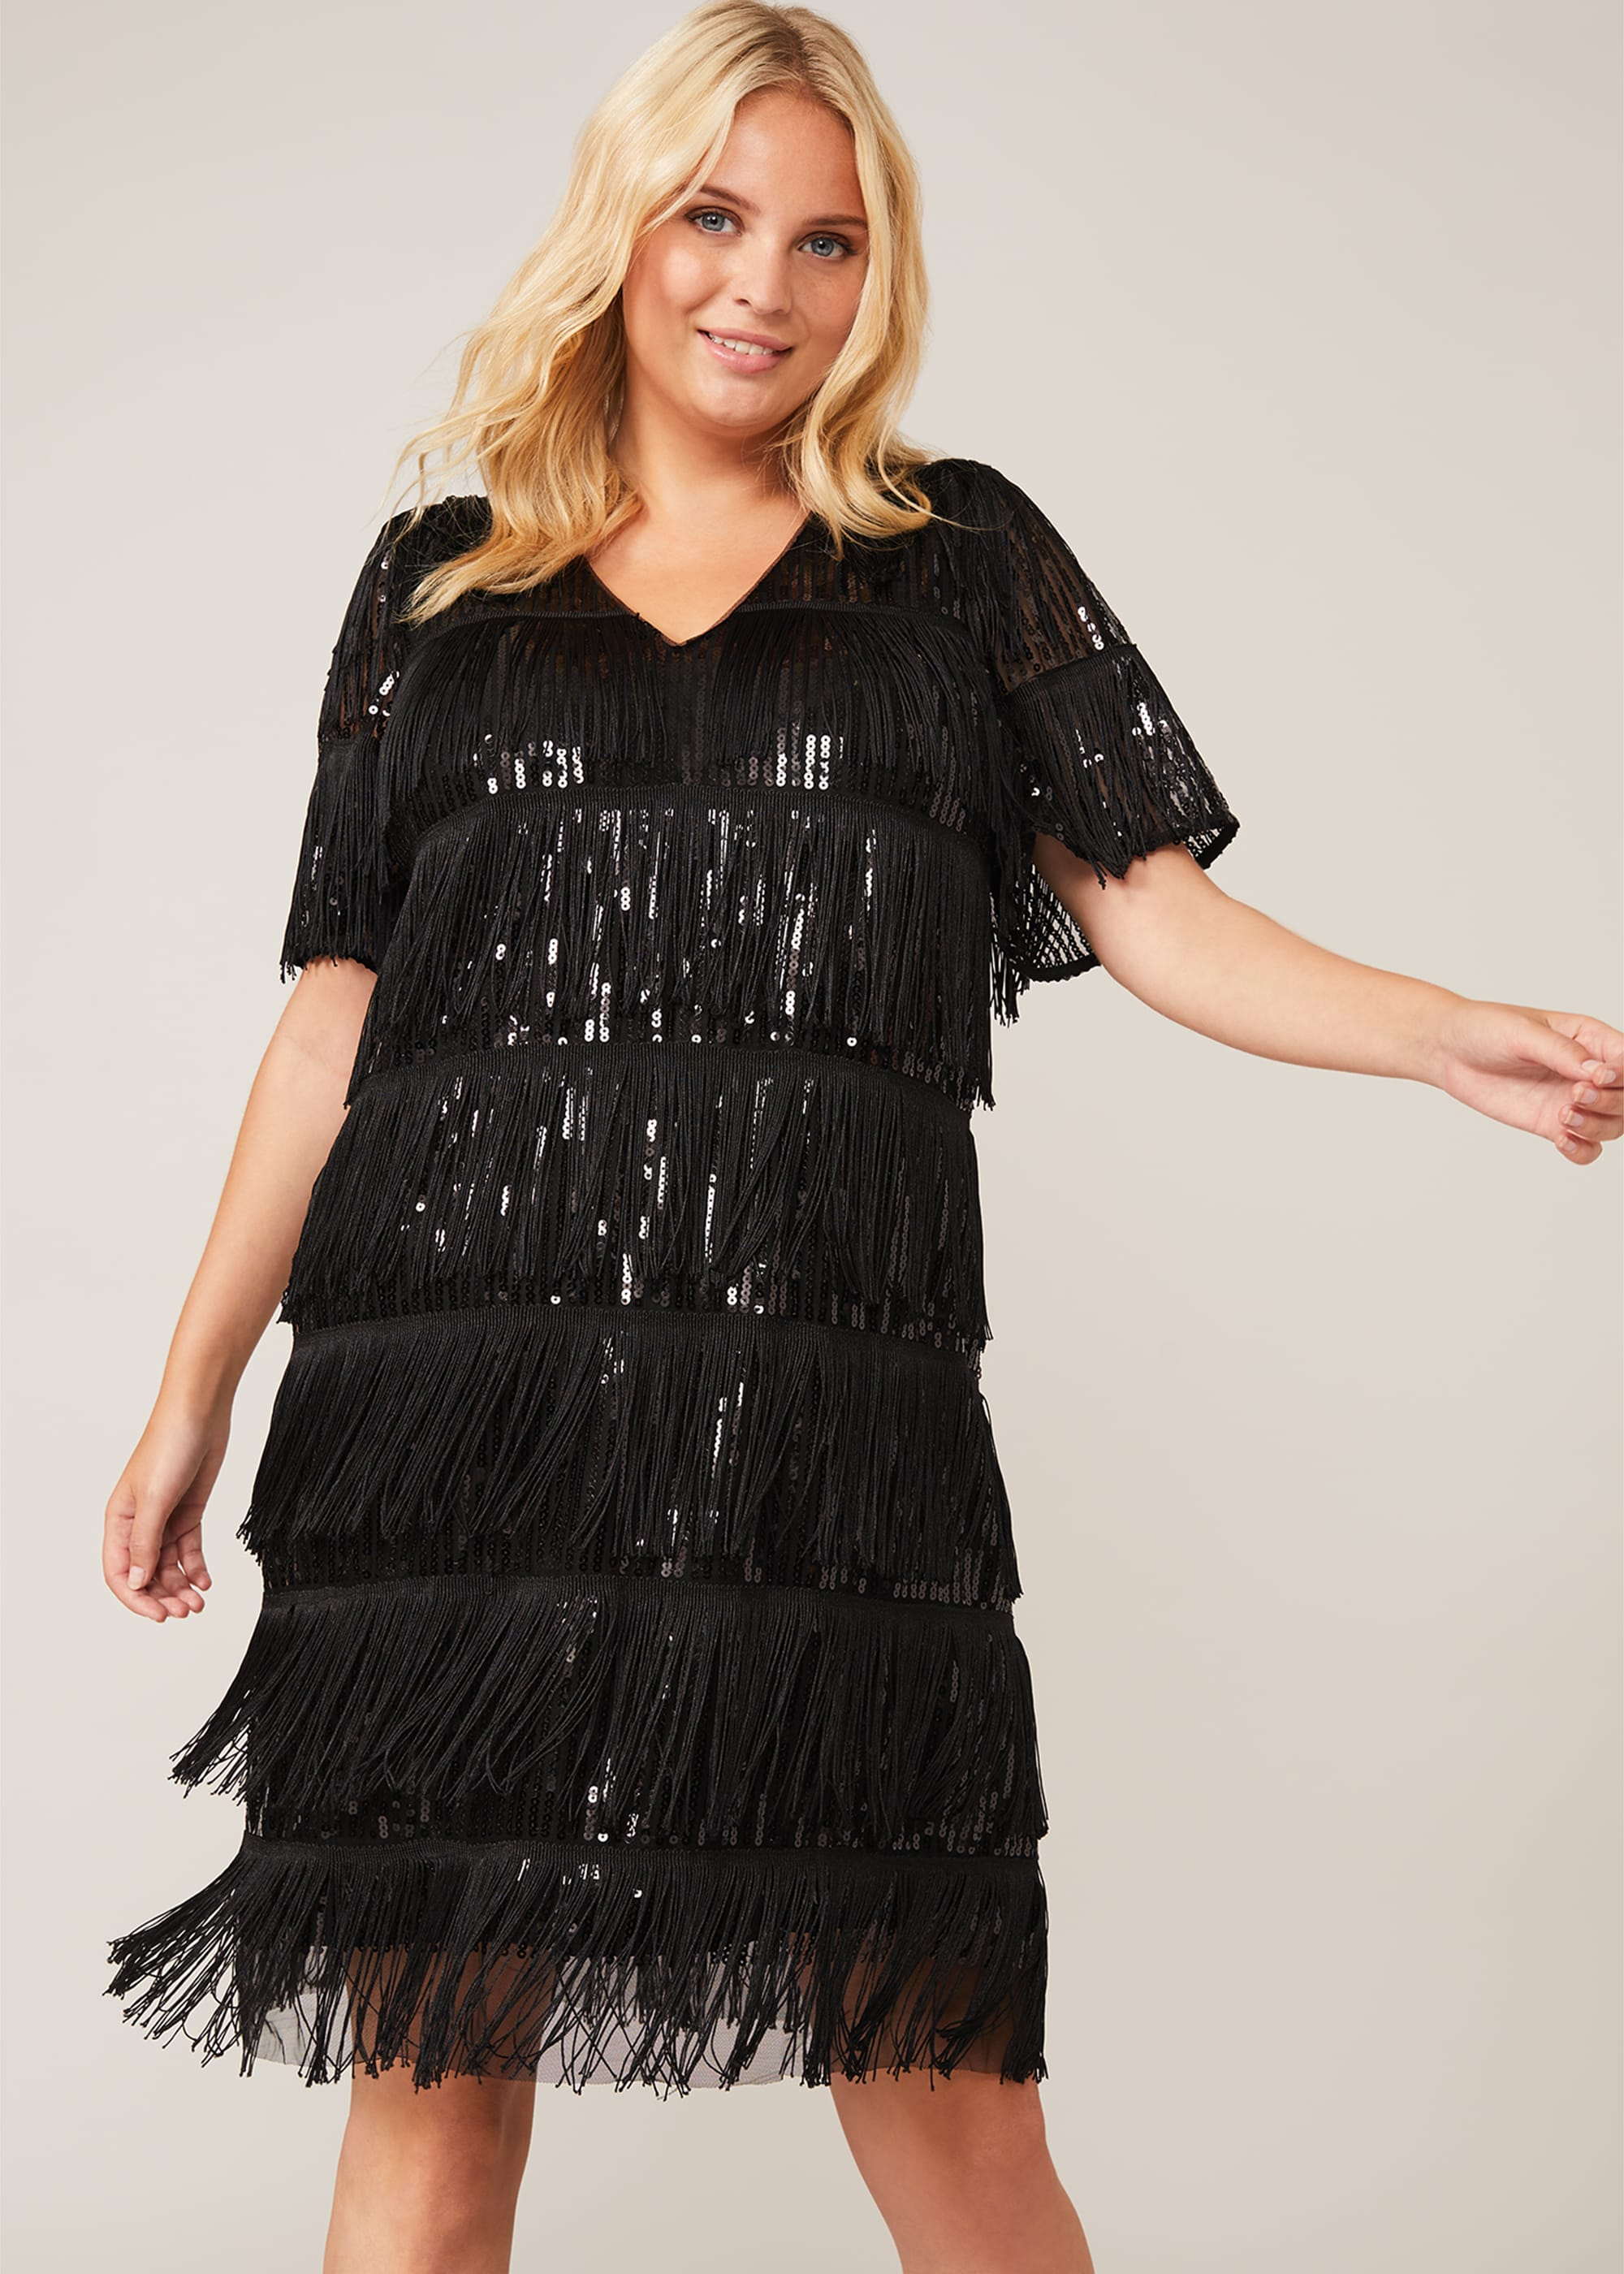 Studio 8 Women Farina Sequin Fringe Dress